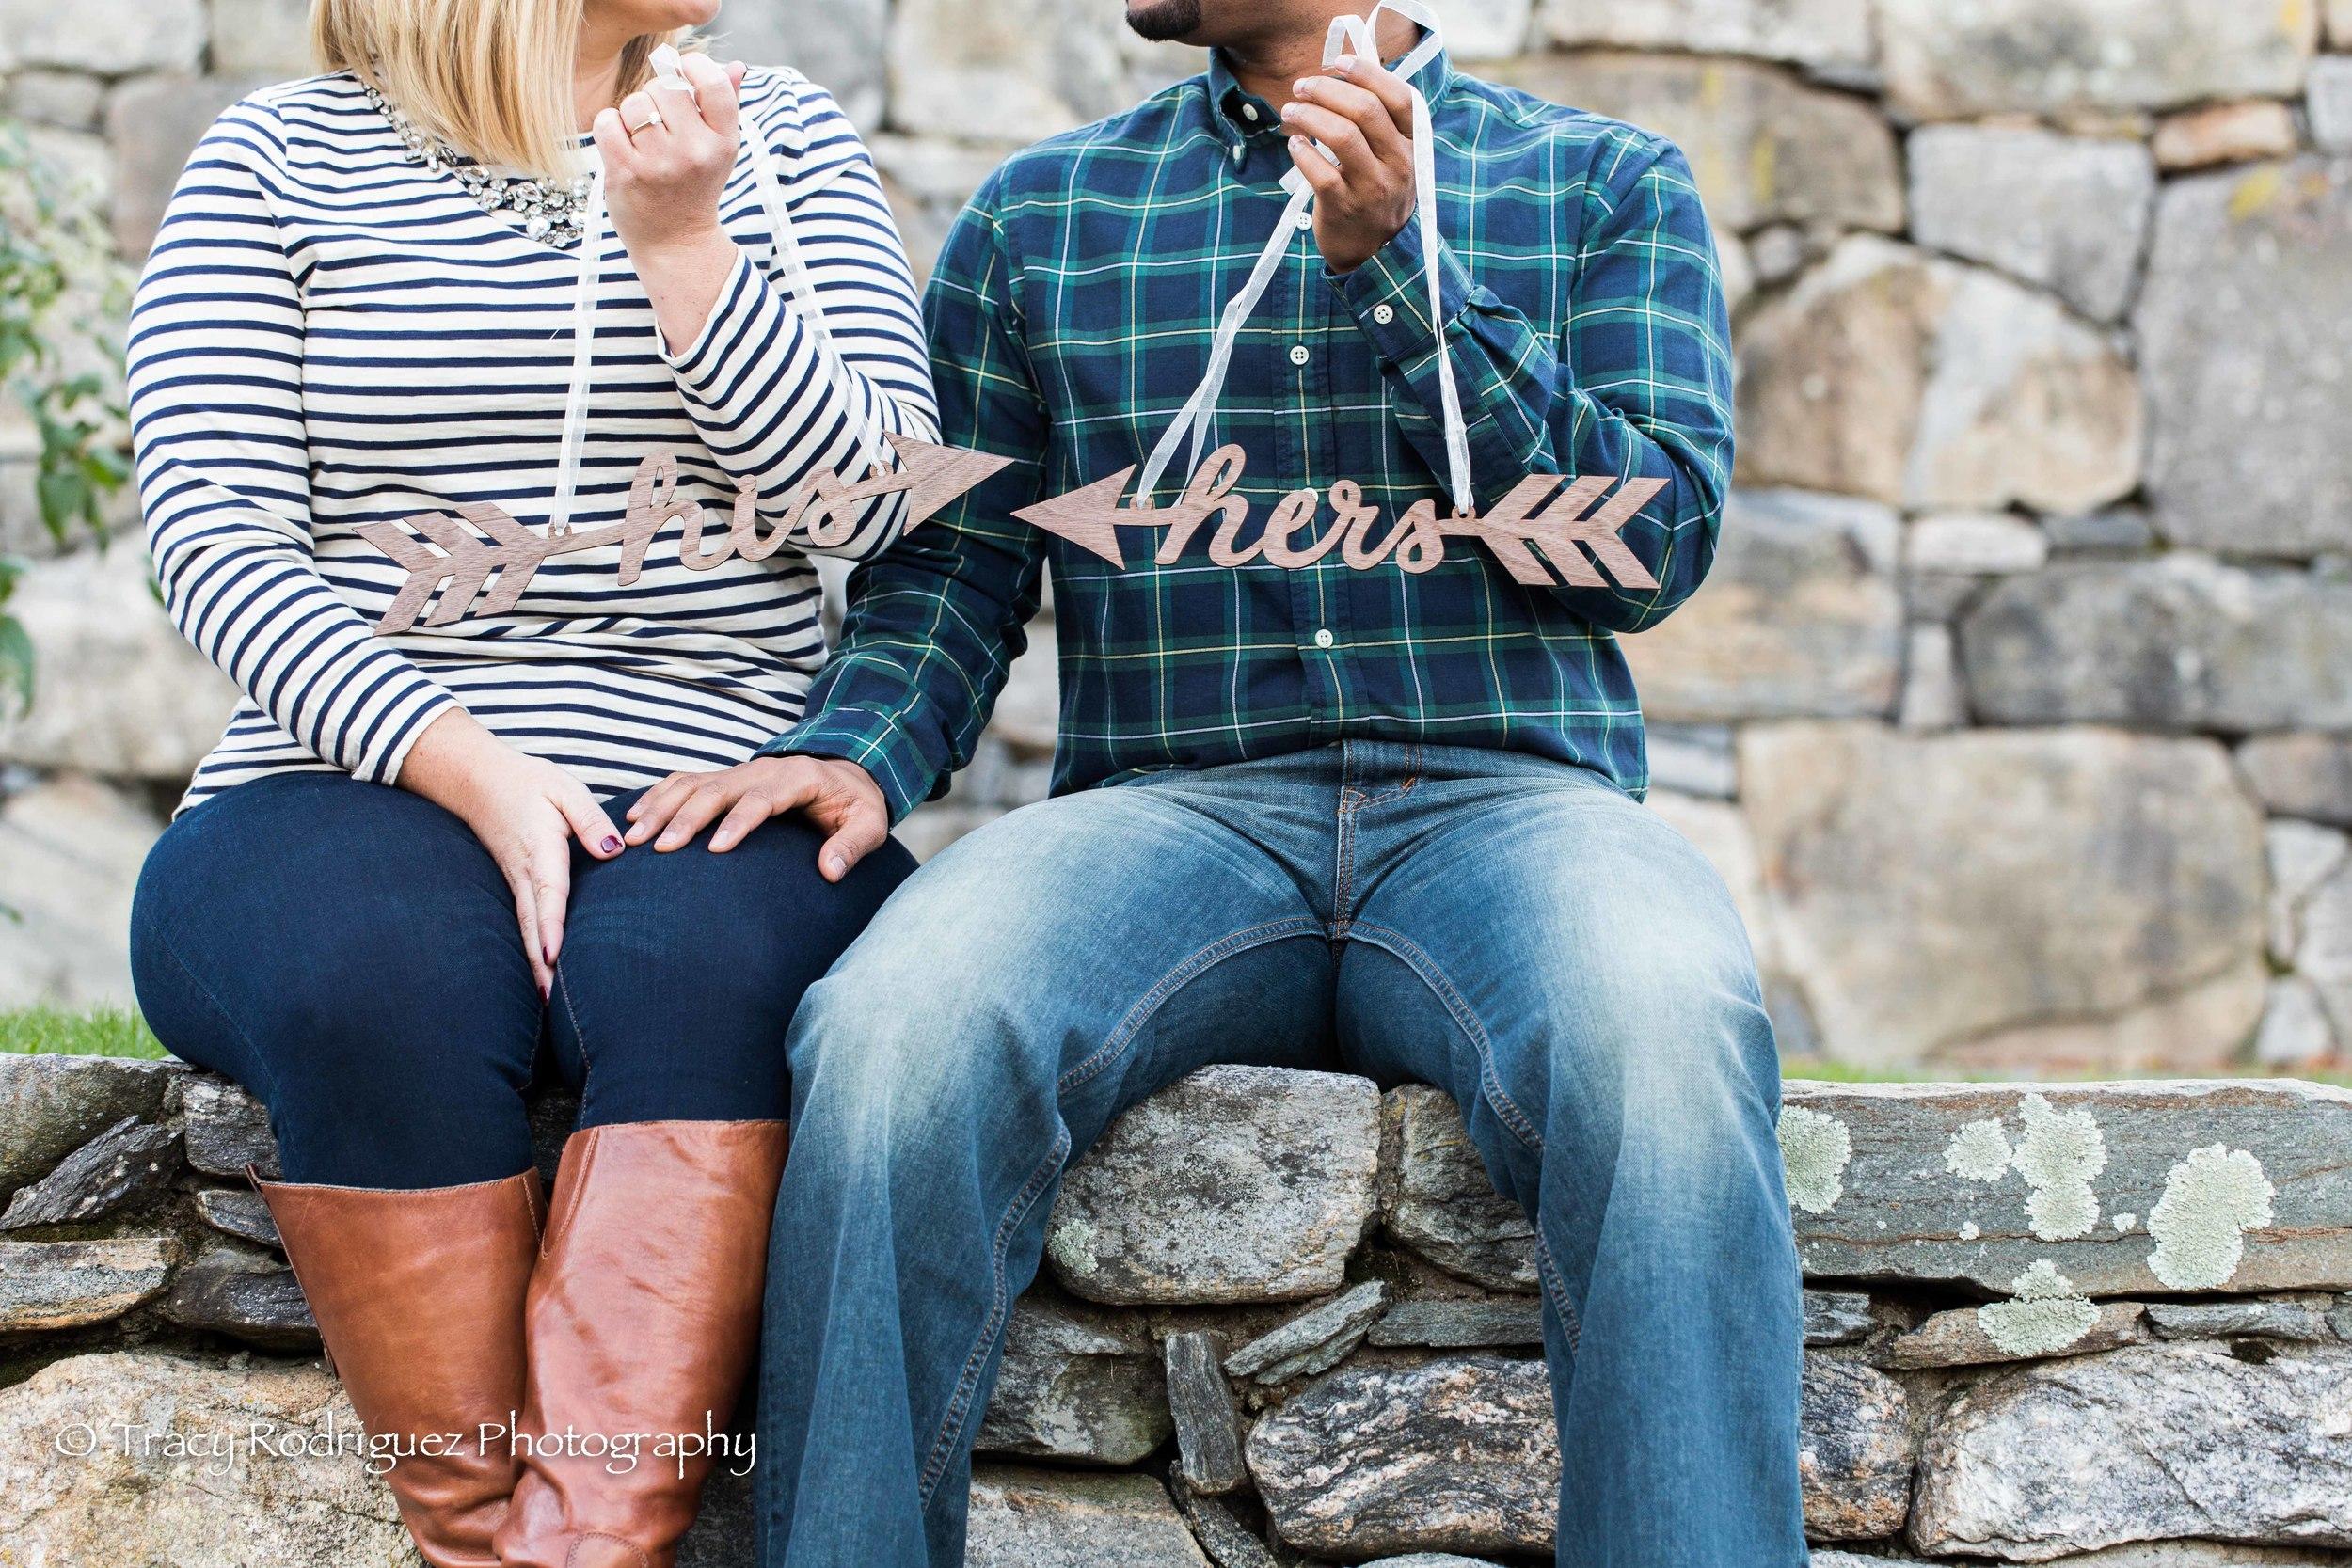 THR-Engagement-AshleyLeBron-14.jpg